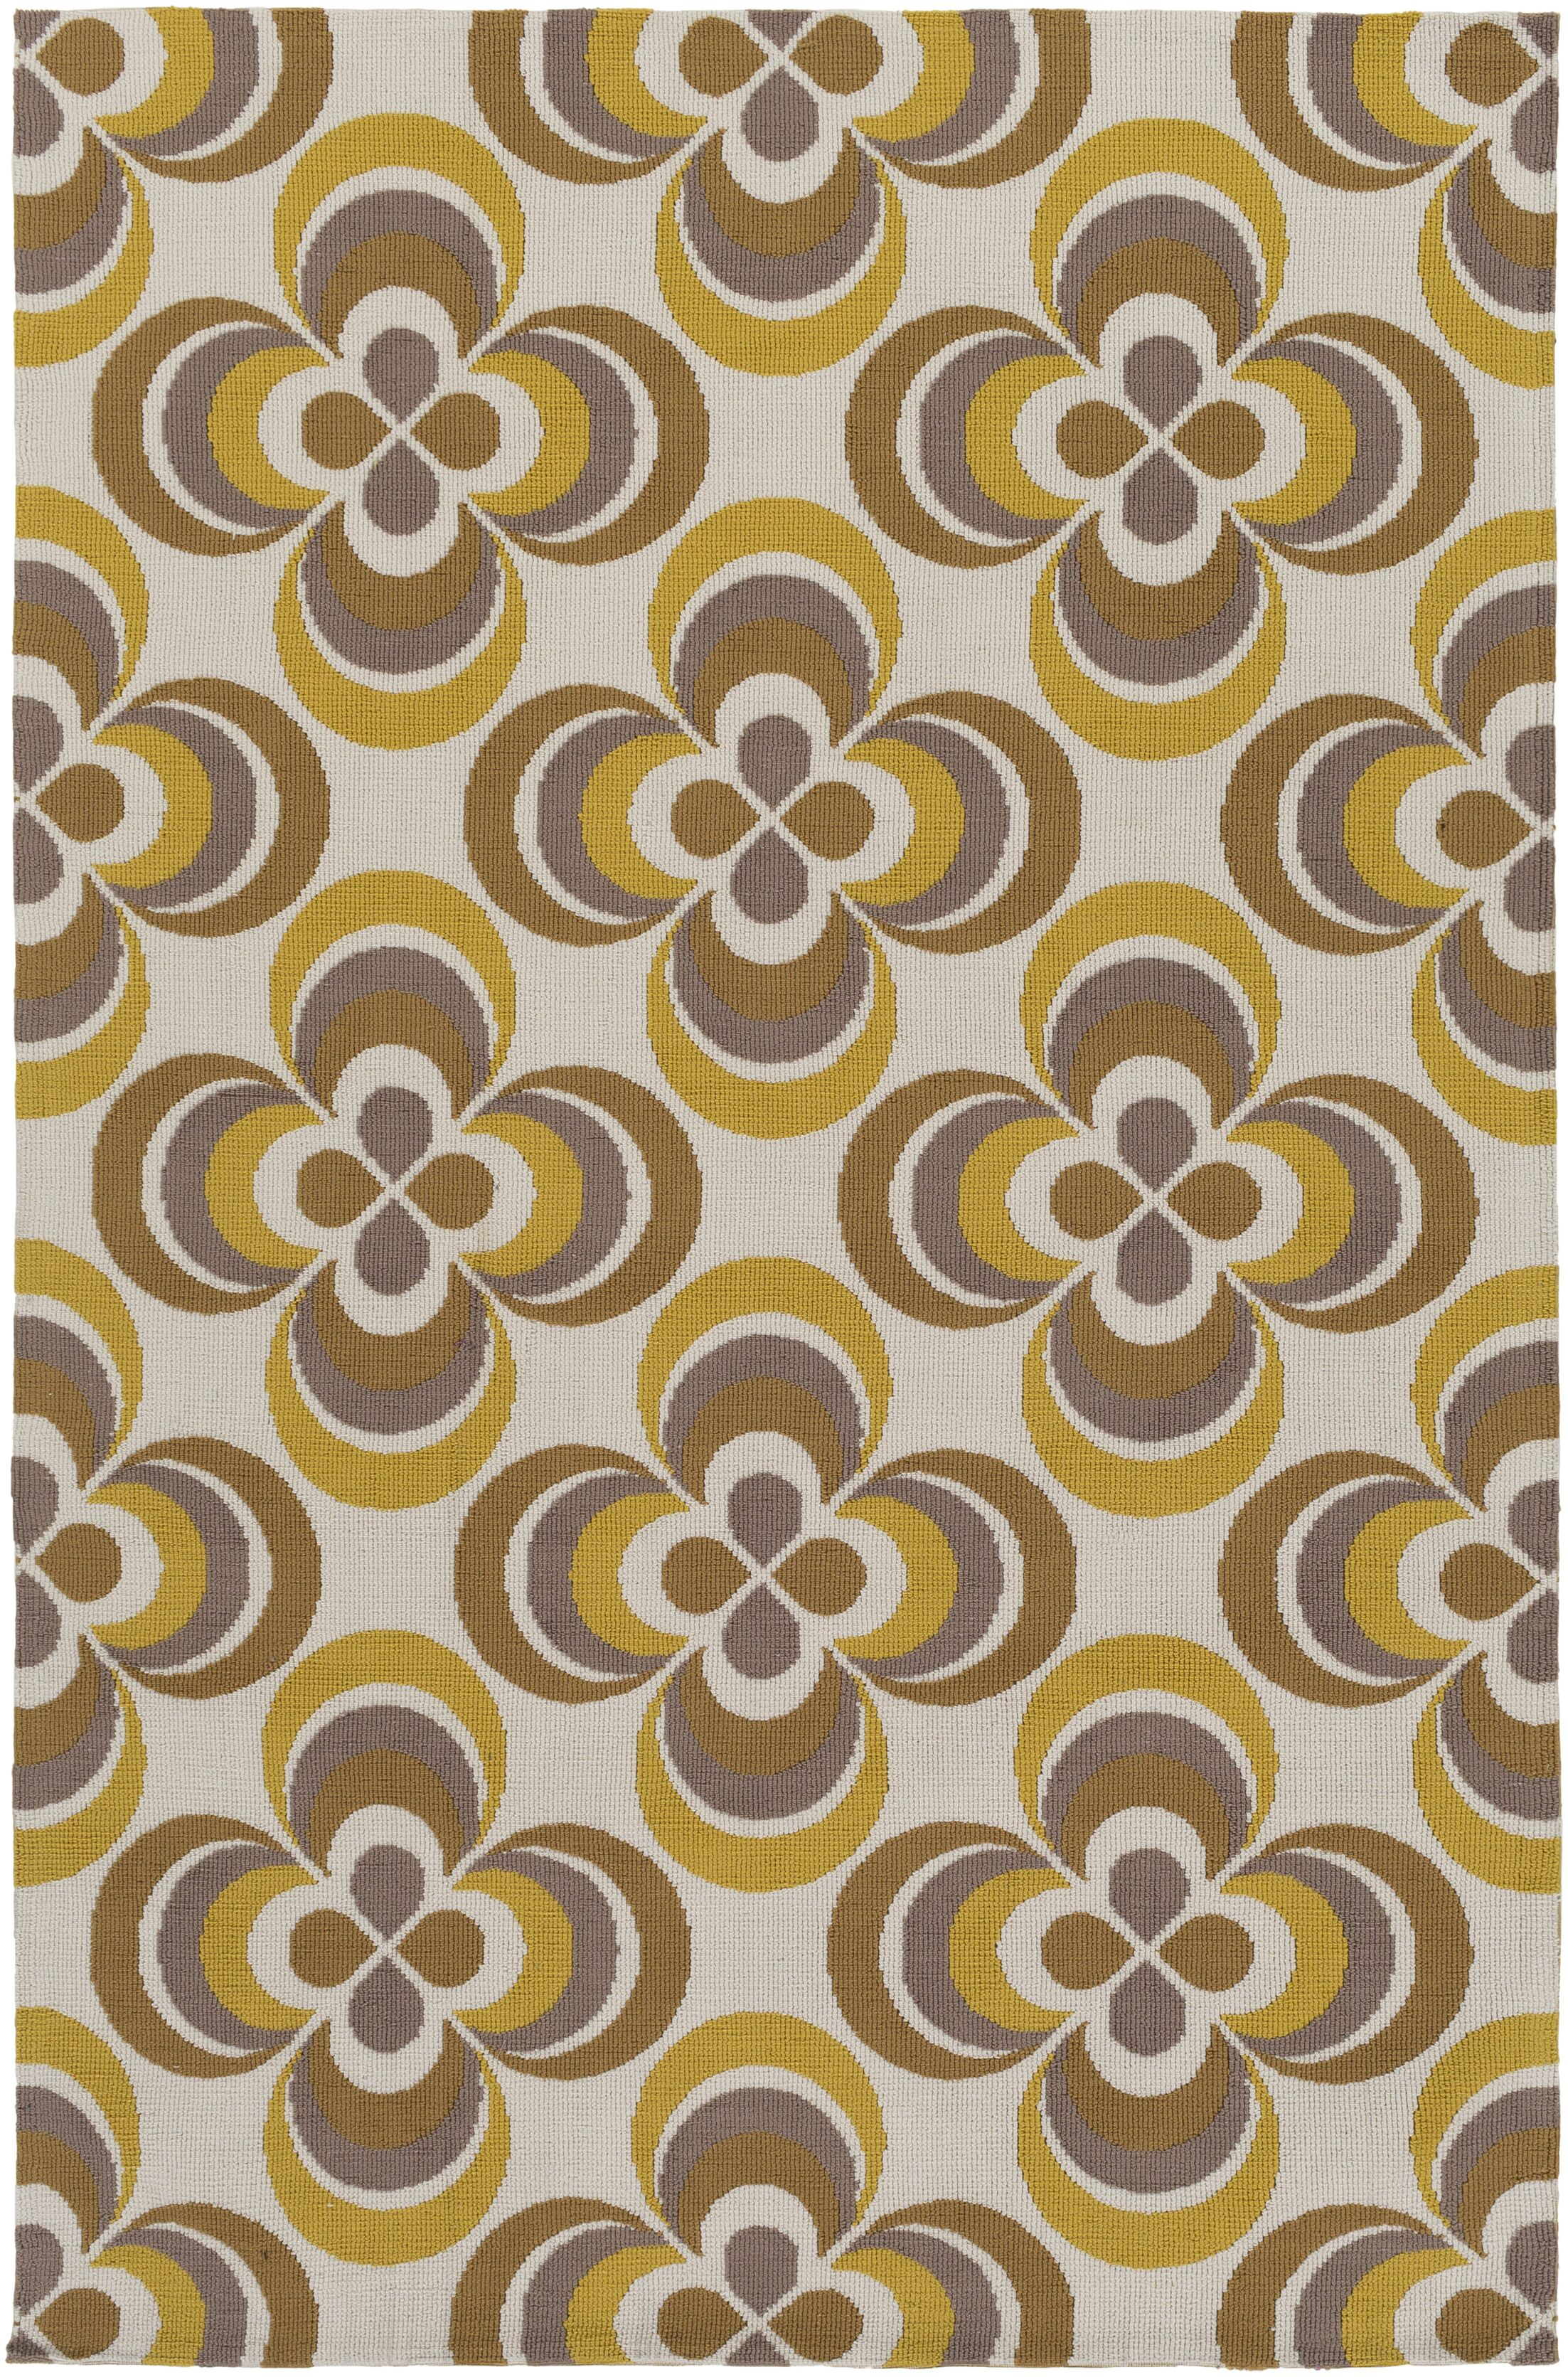 Mraz Gold/Yellow Area Rug Rug Size: Rectangle 3' x 5'